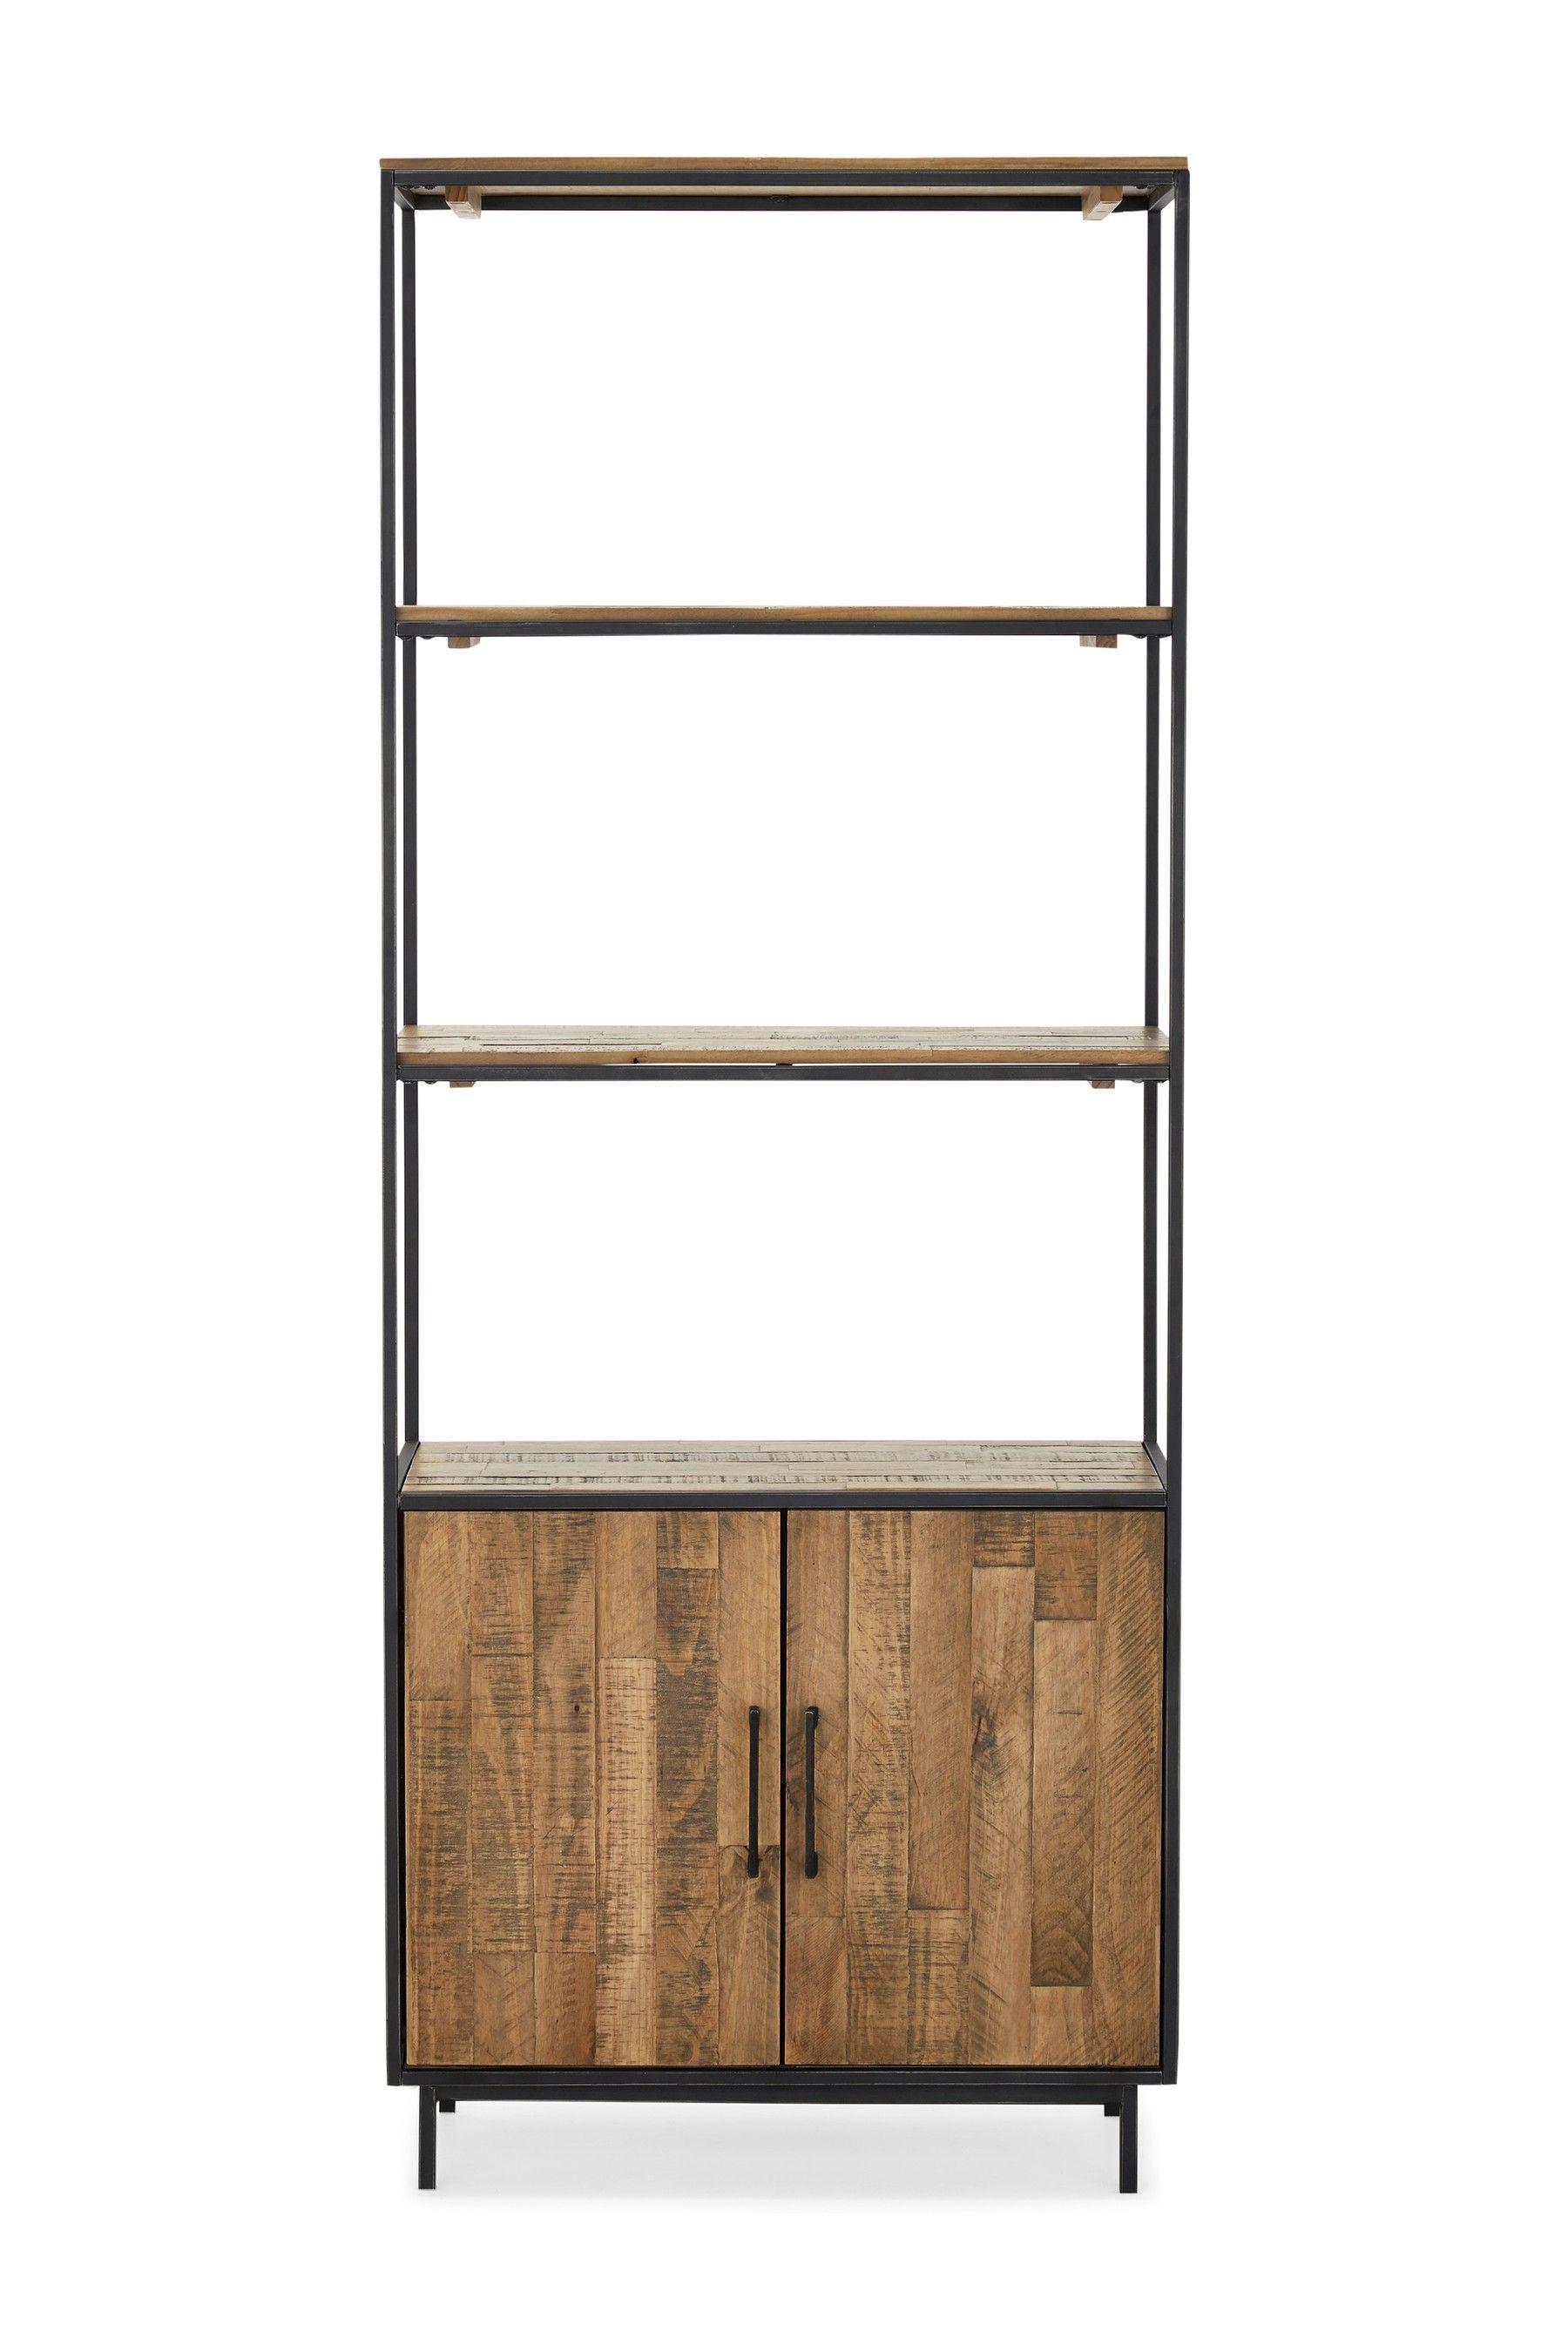 Buy Jefferson Tall Shelf from the Next UK online shop